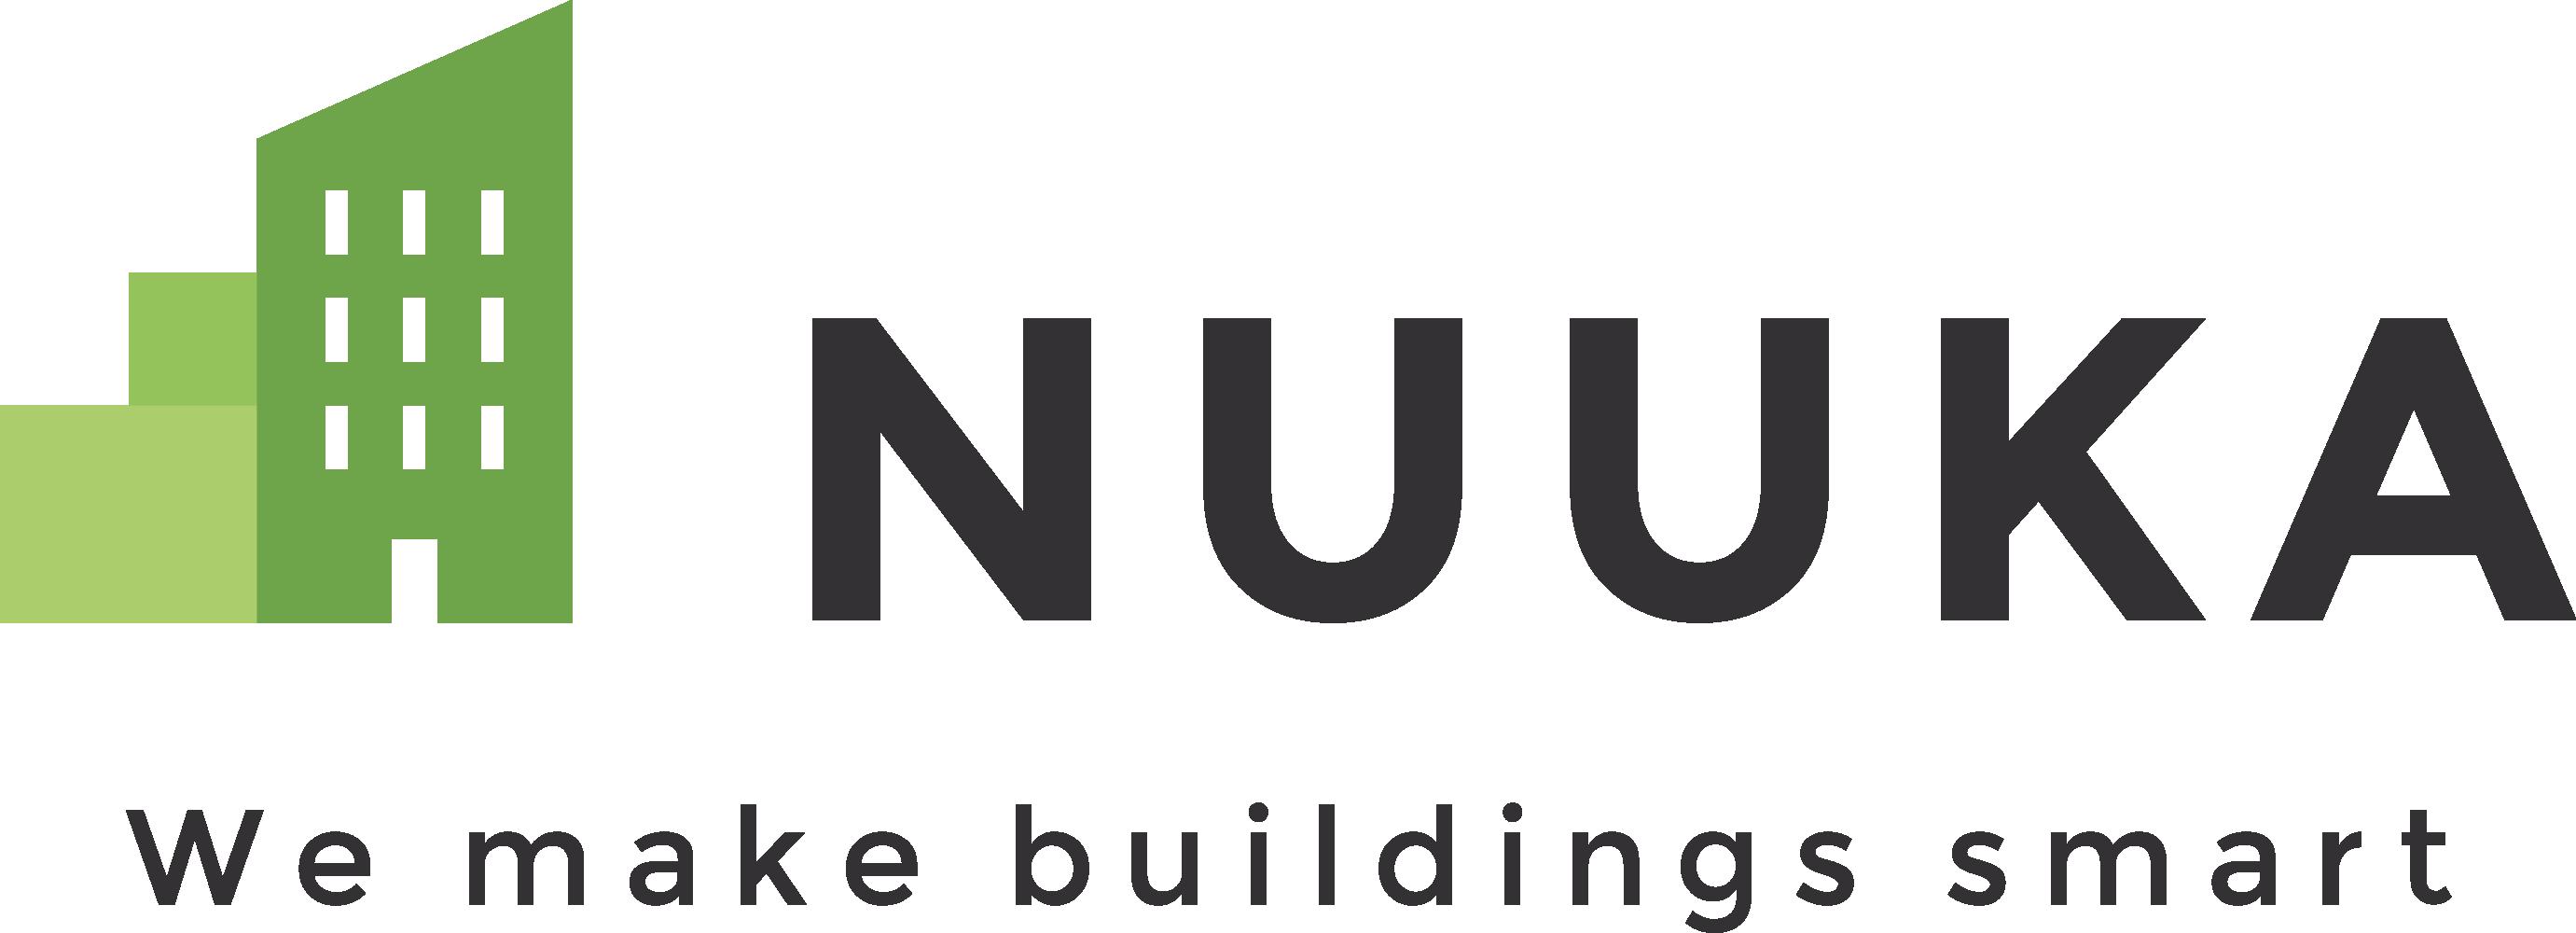 nuuka_logo_slogan_dark-1.png